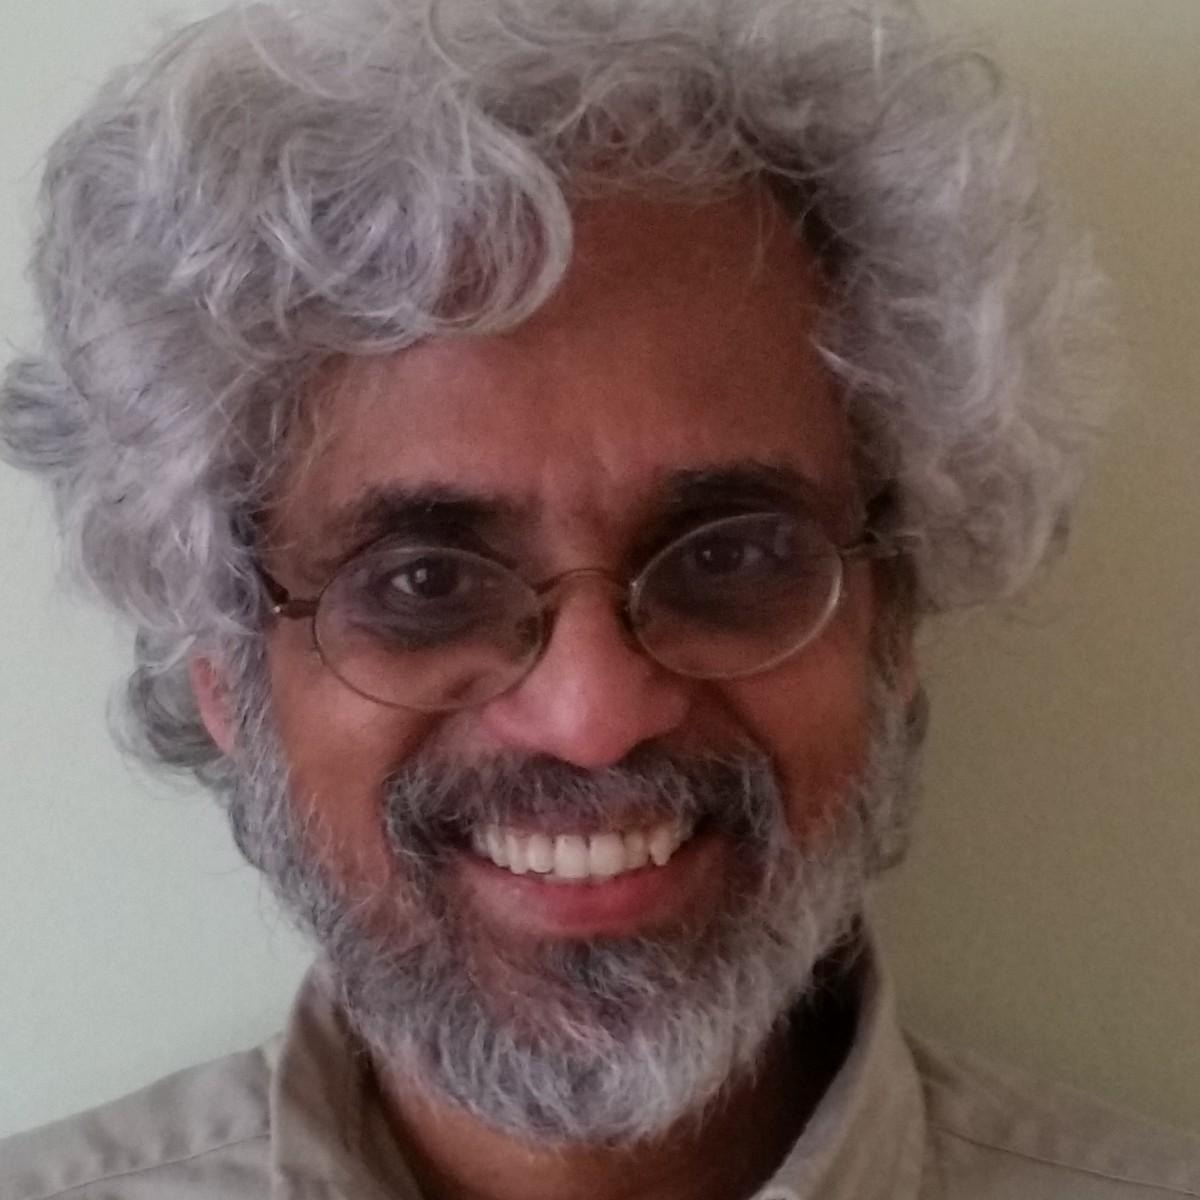 Ajay Skaria